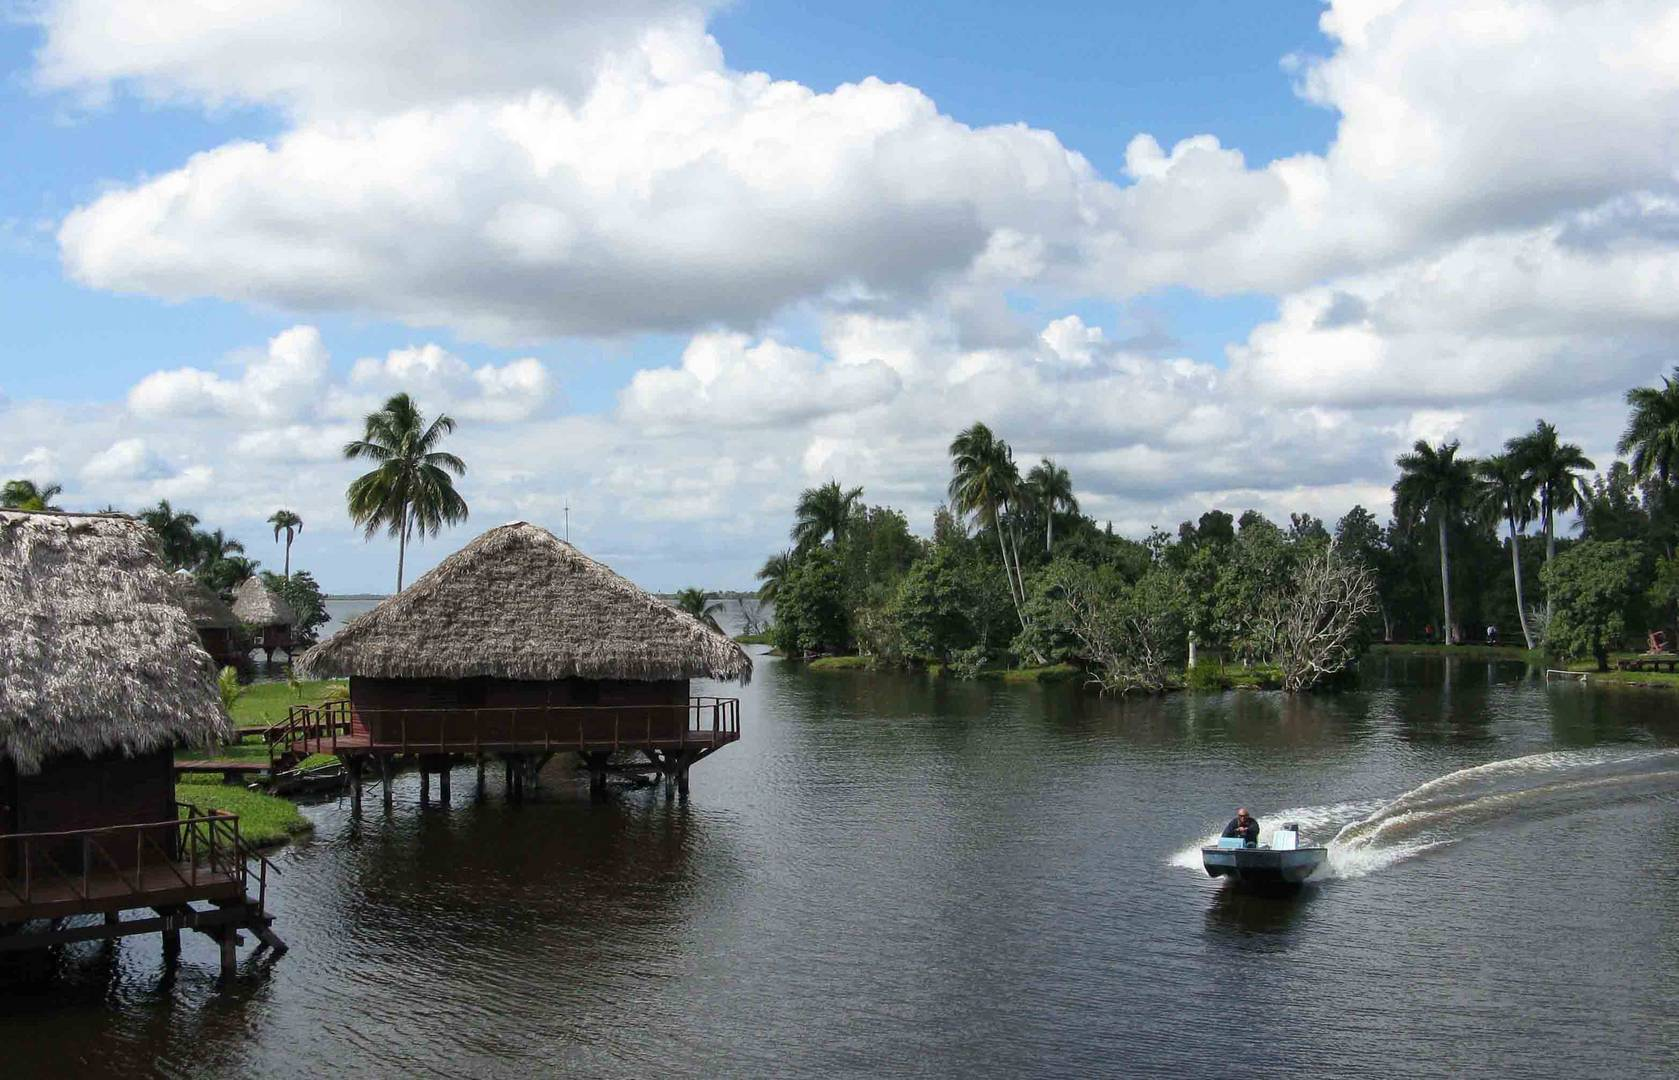 KUBA (Cuba) - Zapata - Schatzsee (Laguna del Tesoro) - GUAMA